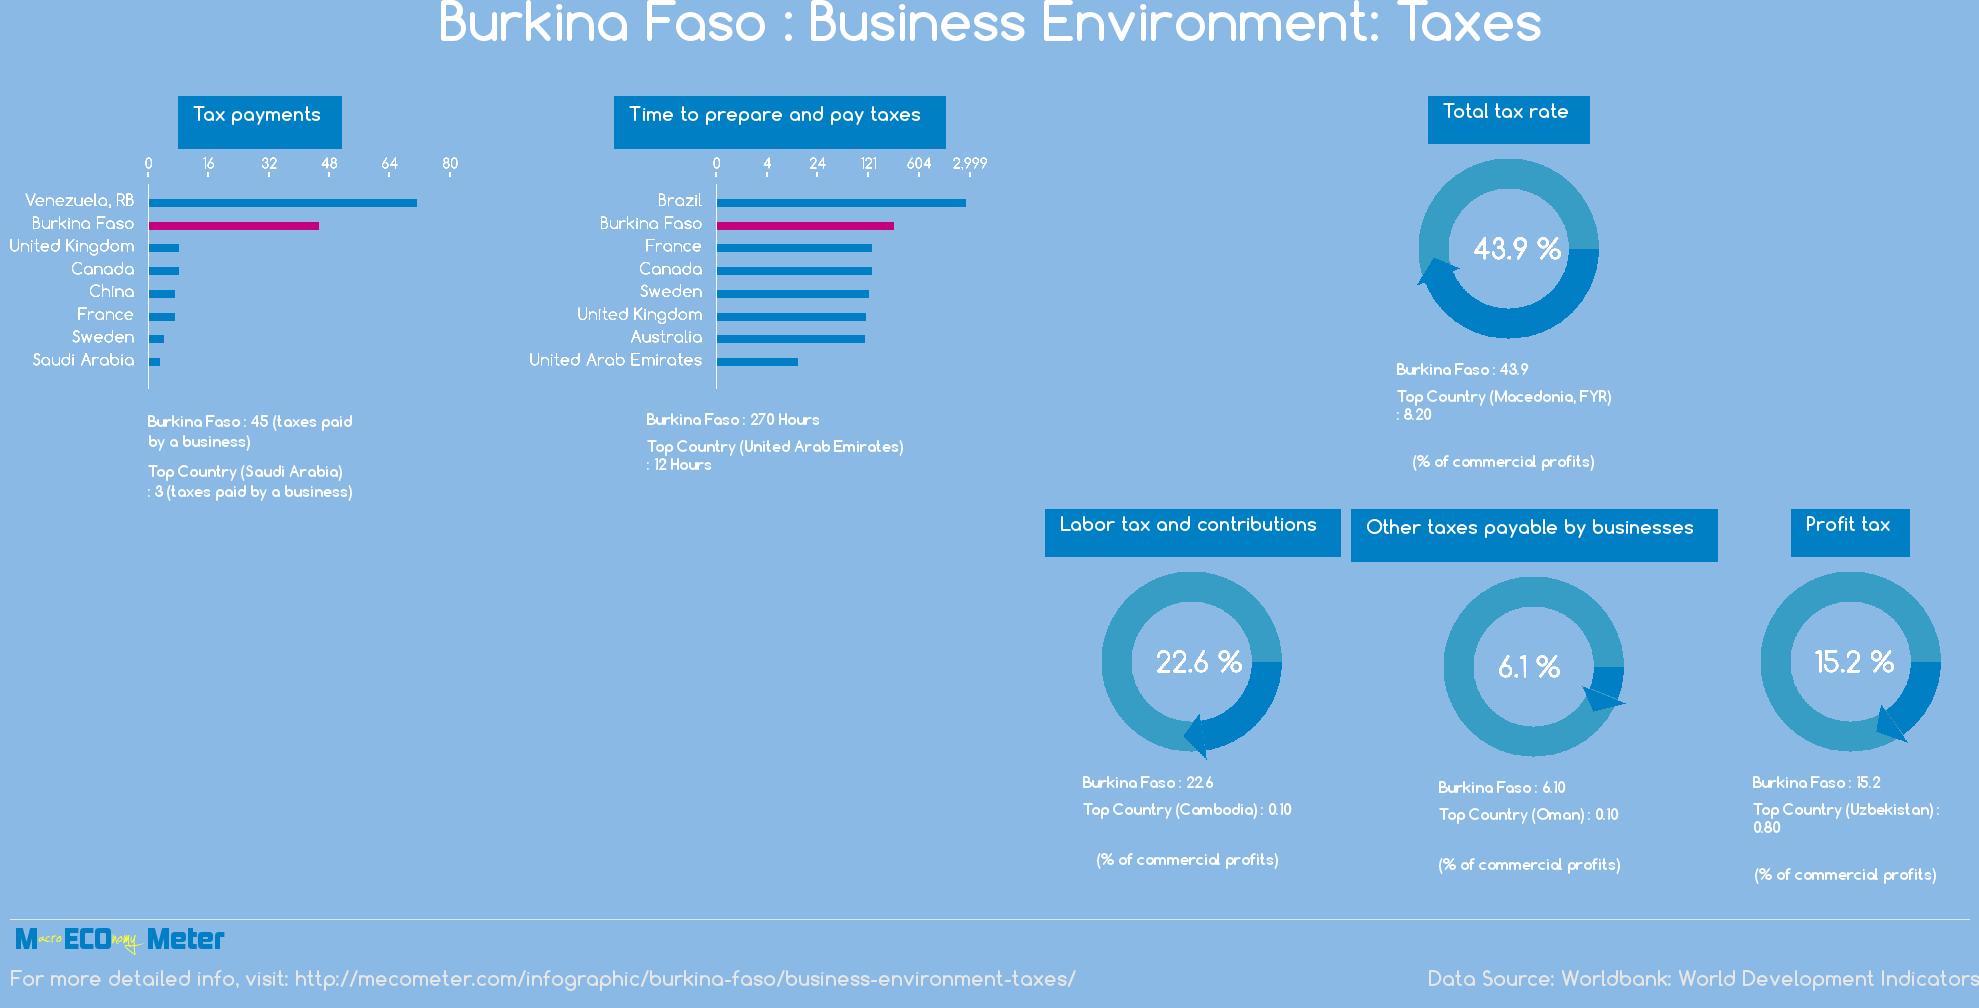 Burkina Faso : Business Environment: Taxes